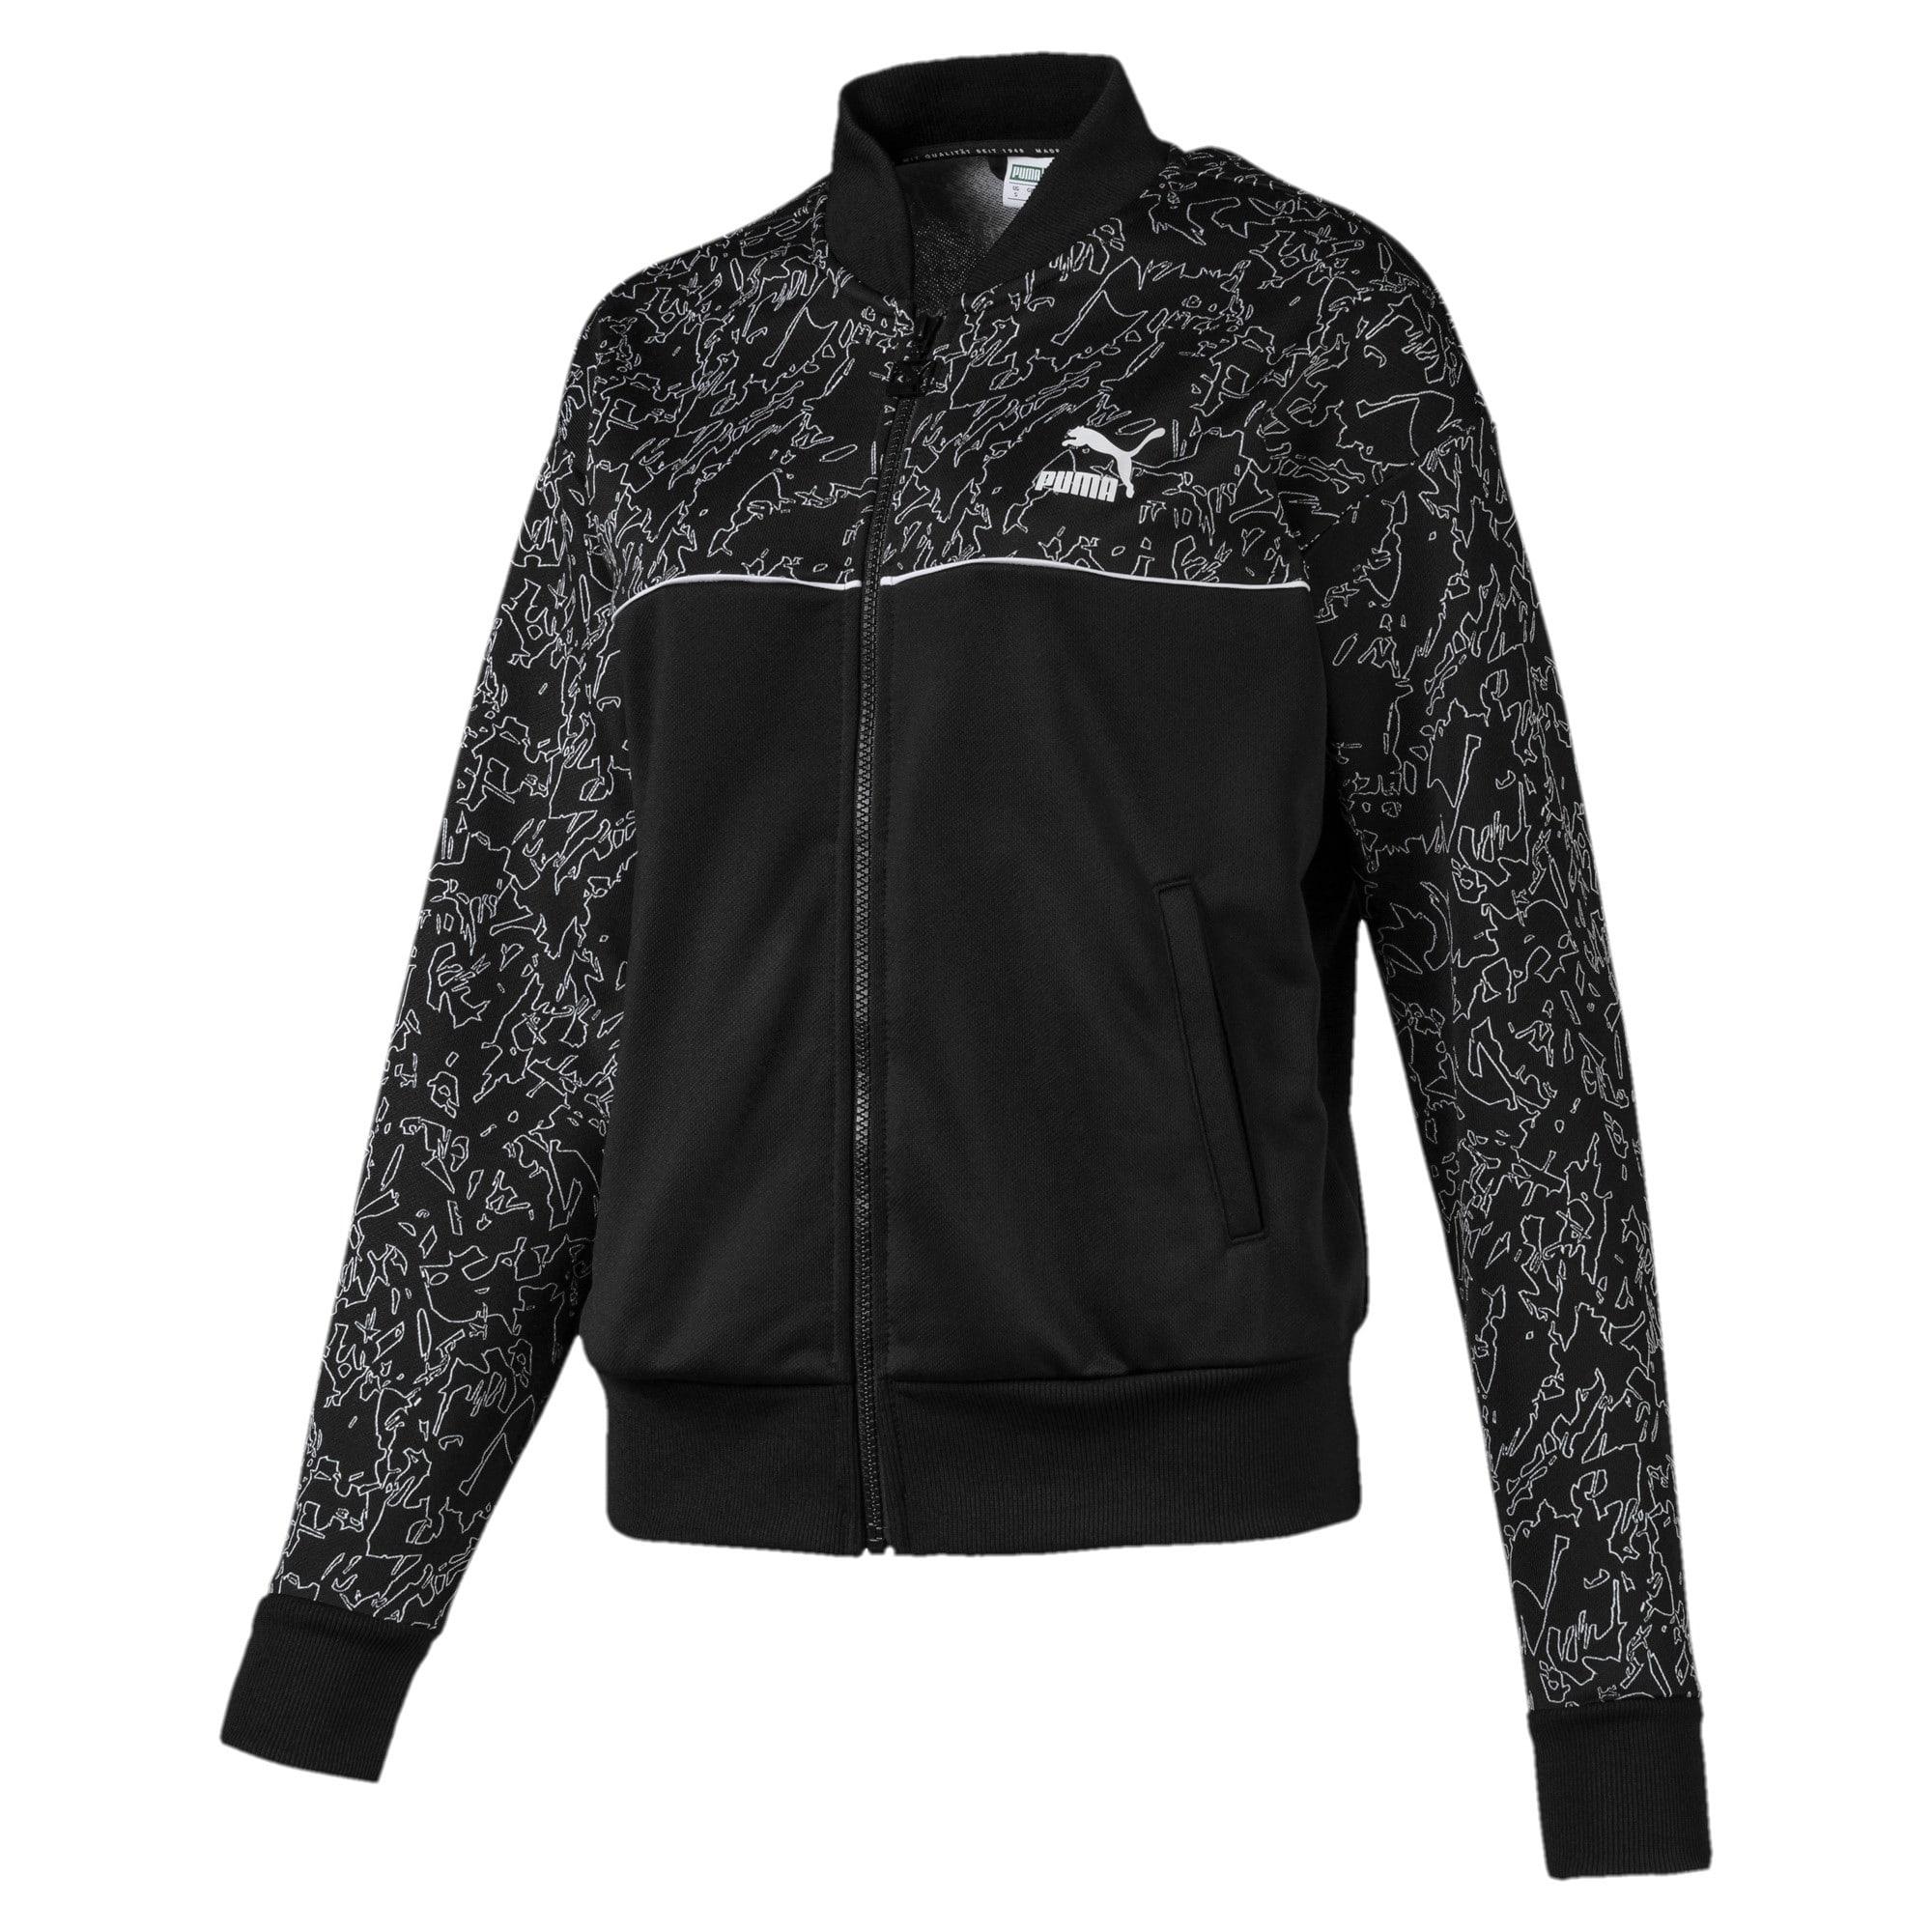 Thumbnail 1 of Full Zip Women's Track Jacket, Puma Black, medium